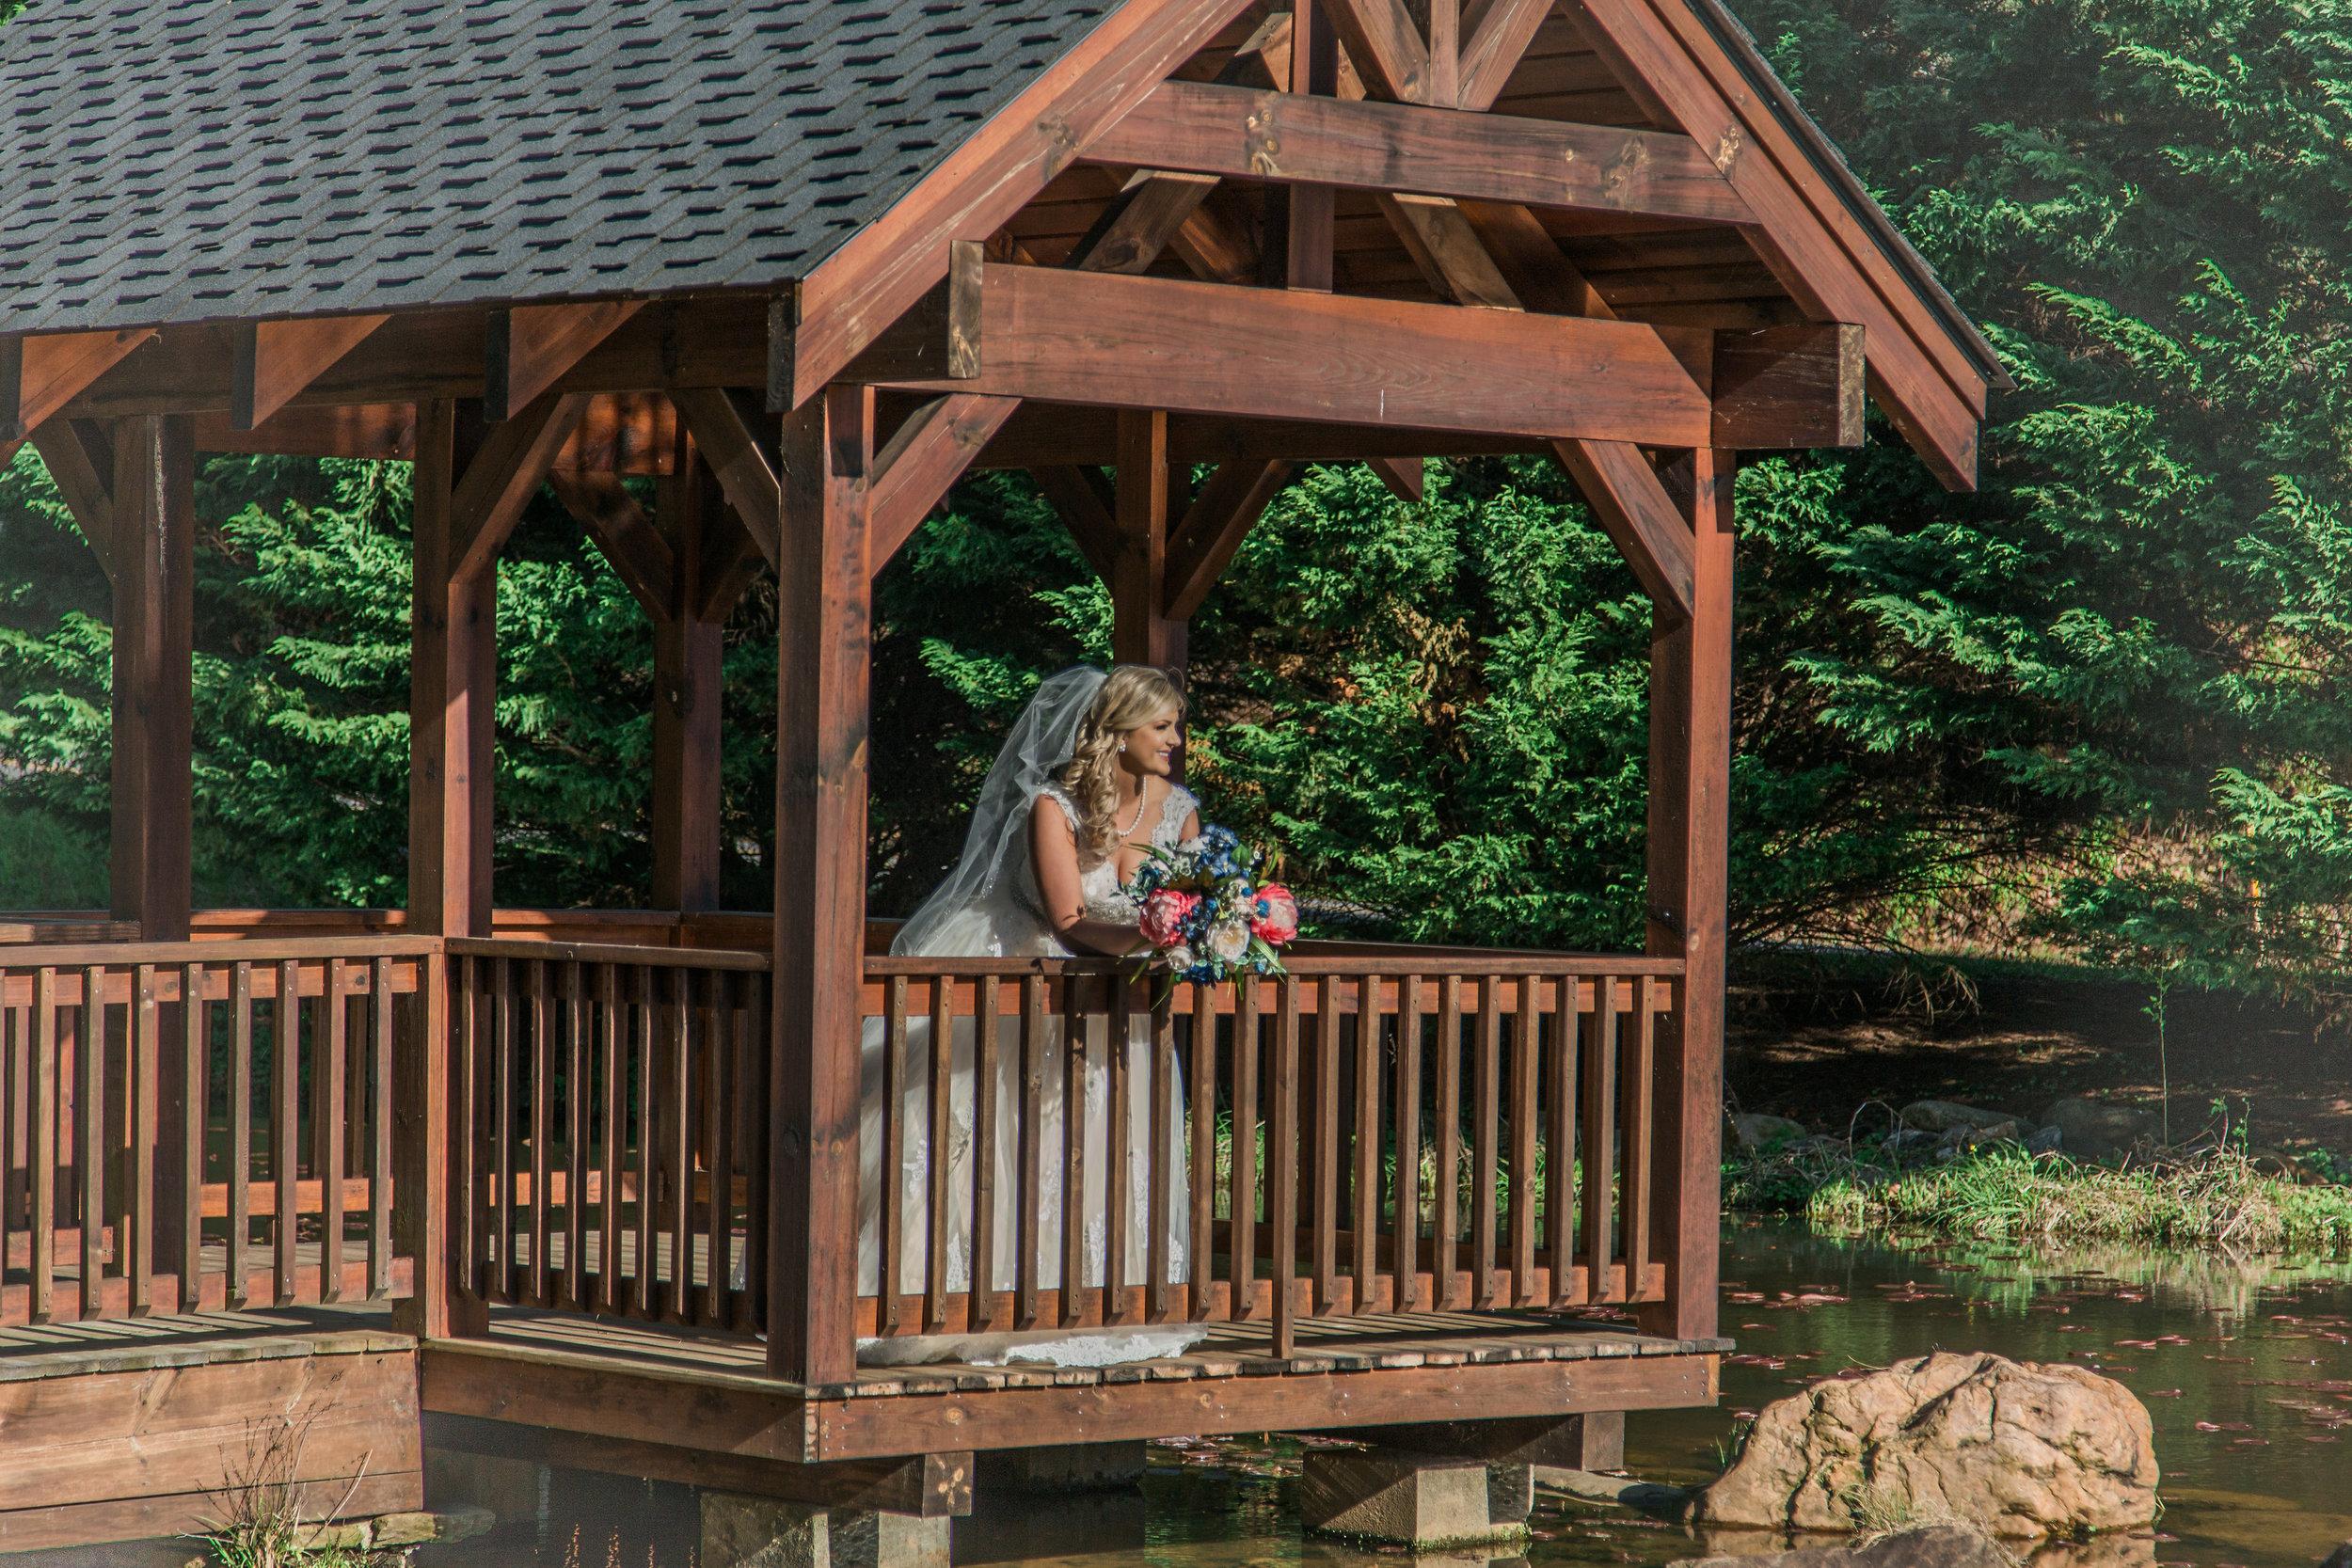 Honeysuckle-Hill-Asheville-Wedding-Venue-Ann-Cordell-Bridal-103.JPG